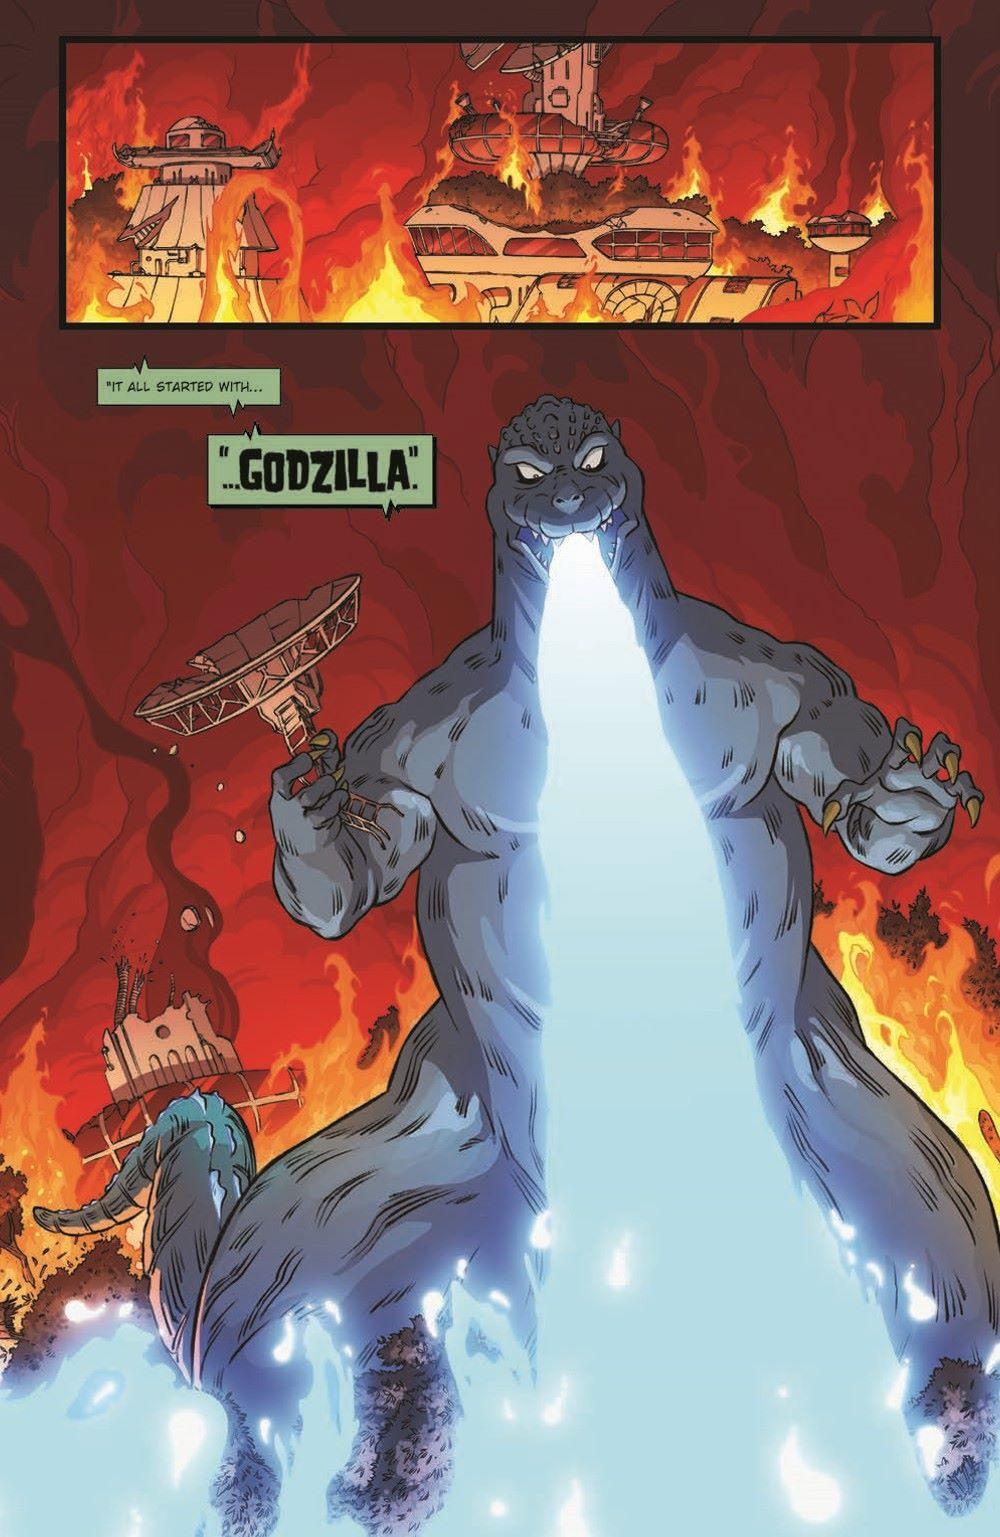 Godzilla_MnP_01_pr-4 ComicList Previews: GODZILLA MONSTERS AND PROTECTORS #1 (OF 5)